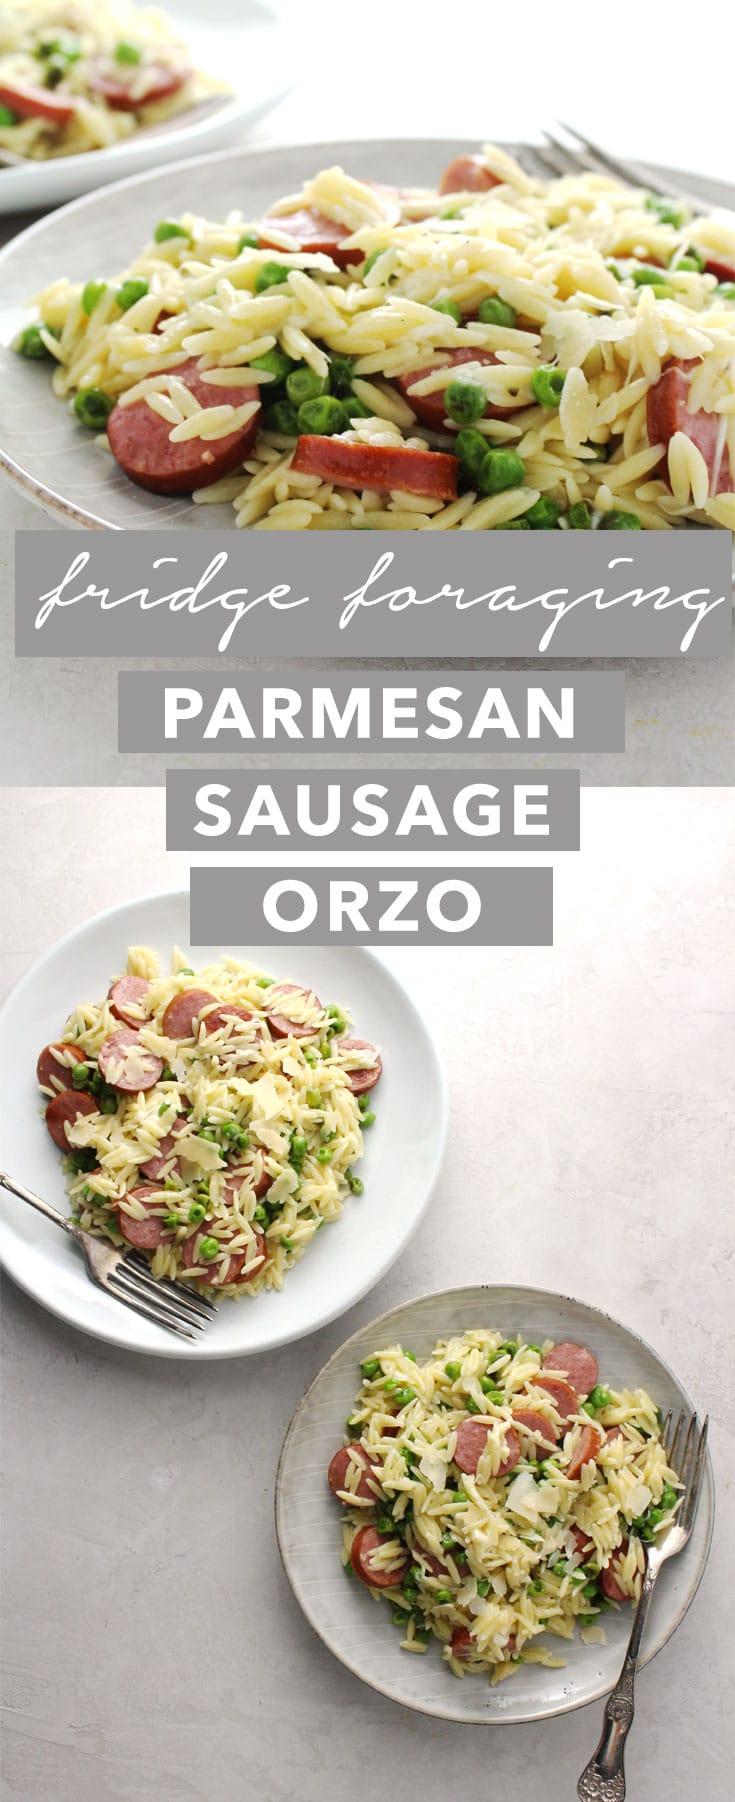 Parmesan Sausage Orzo